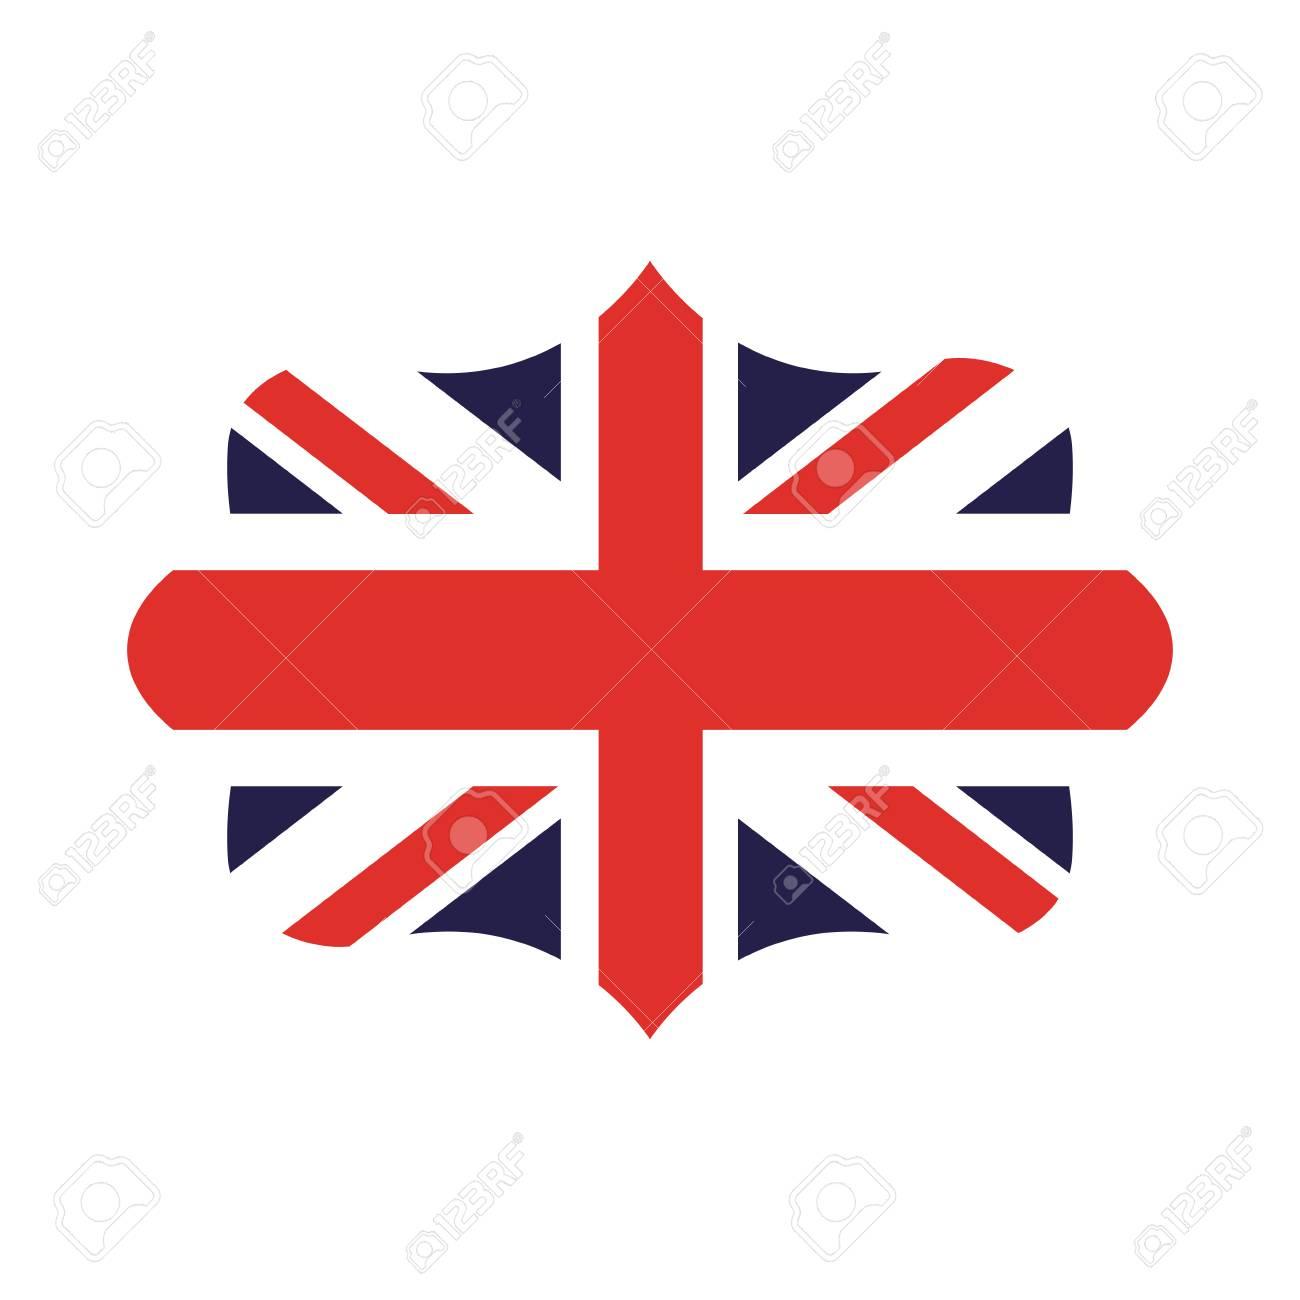 Drapeau Angleterre Isolé Icône Dessin Vectoriel tout Dessin De Angleterre